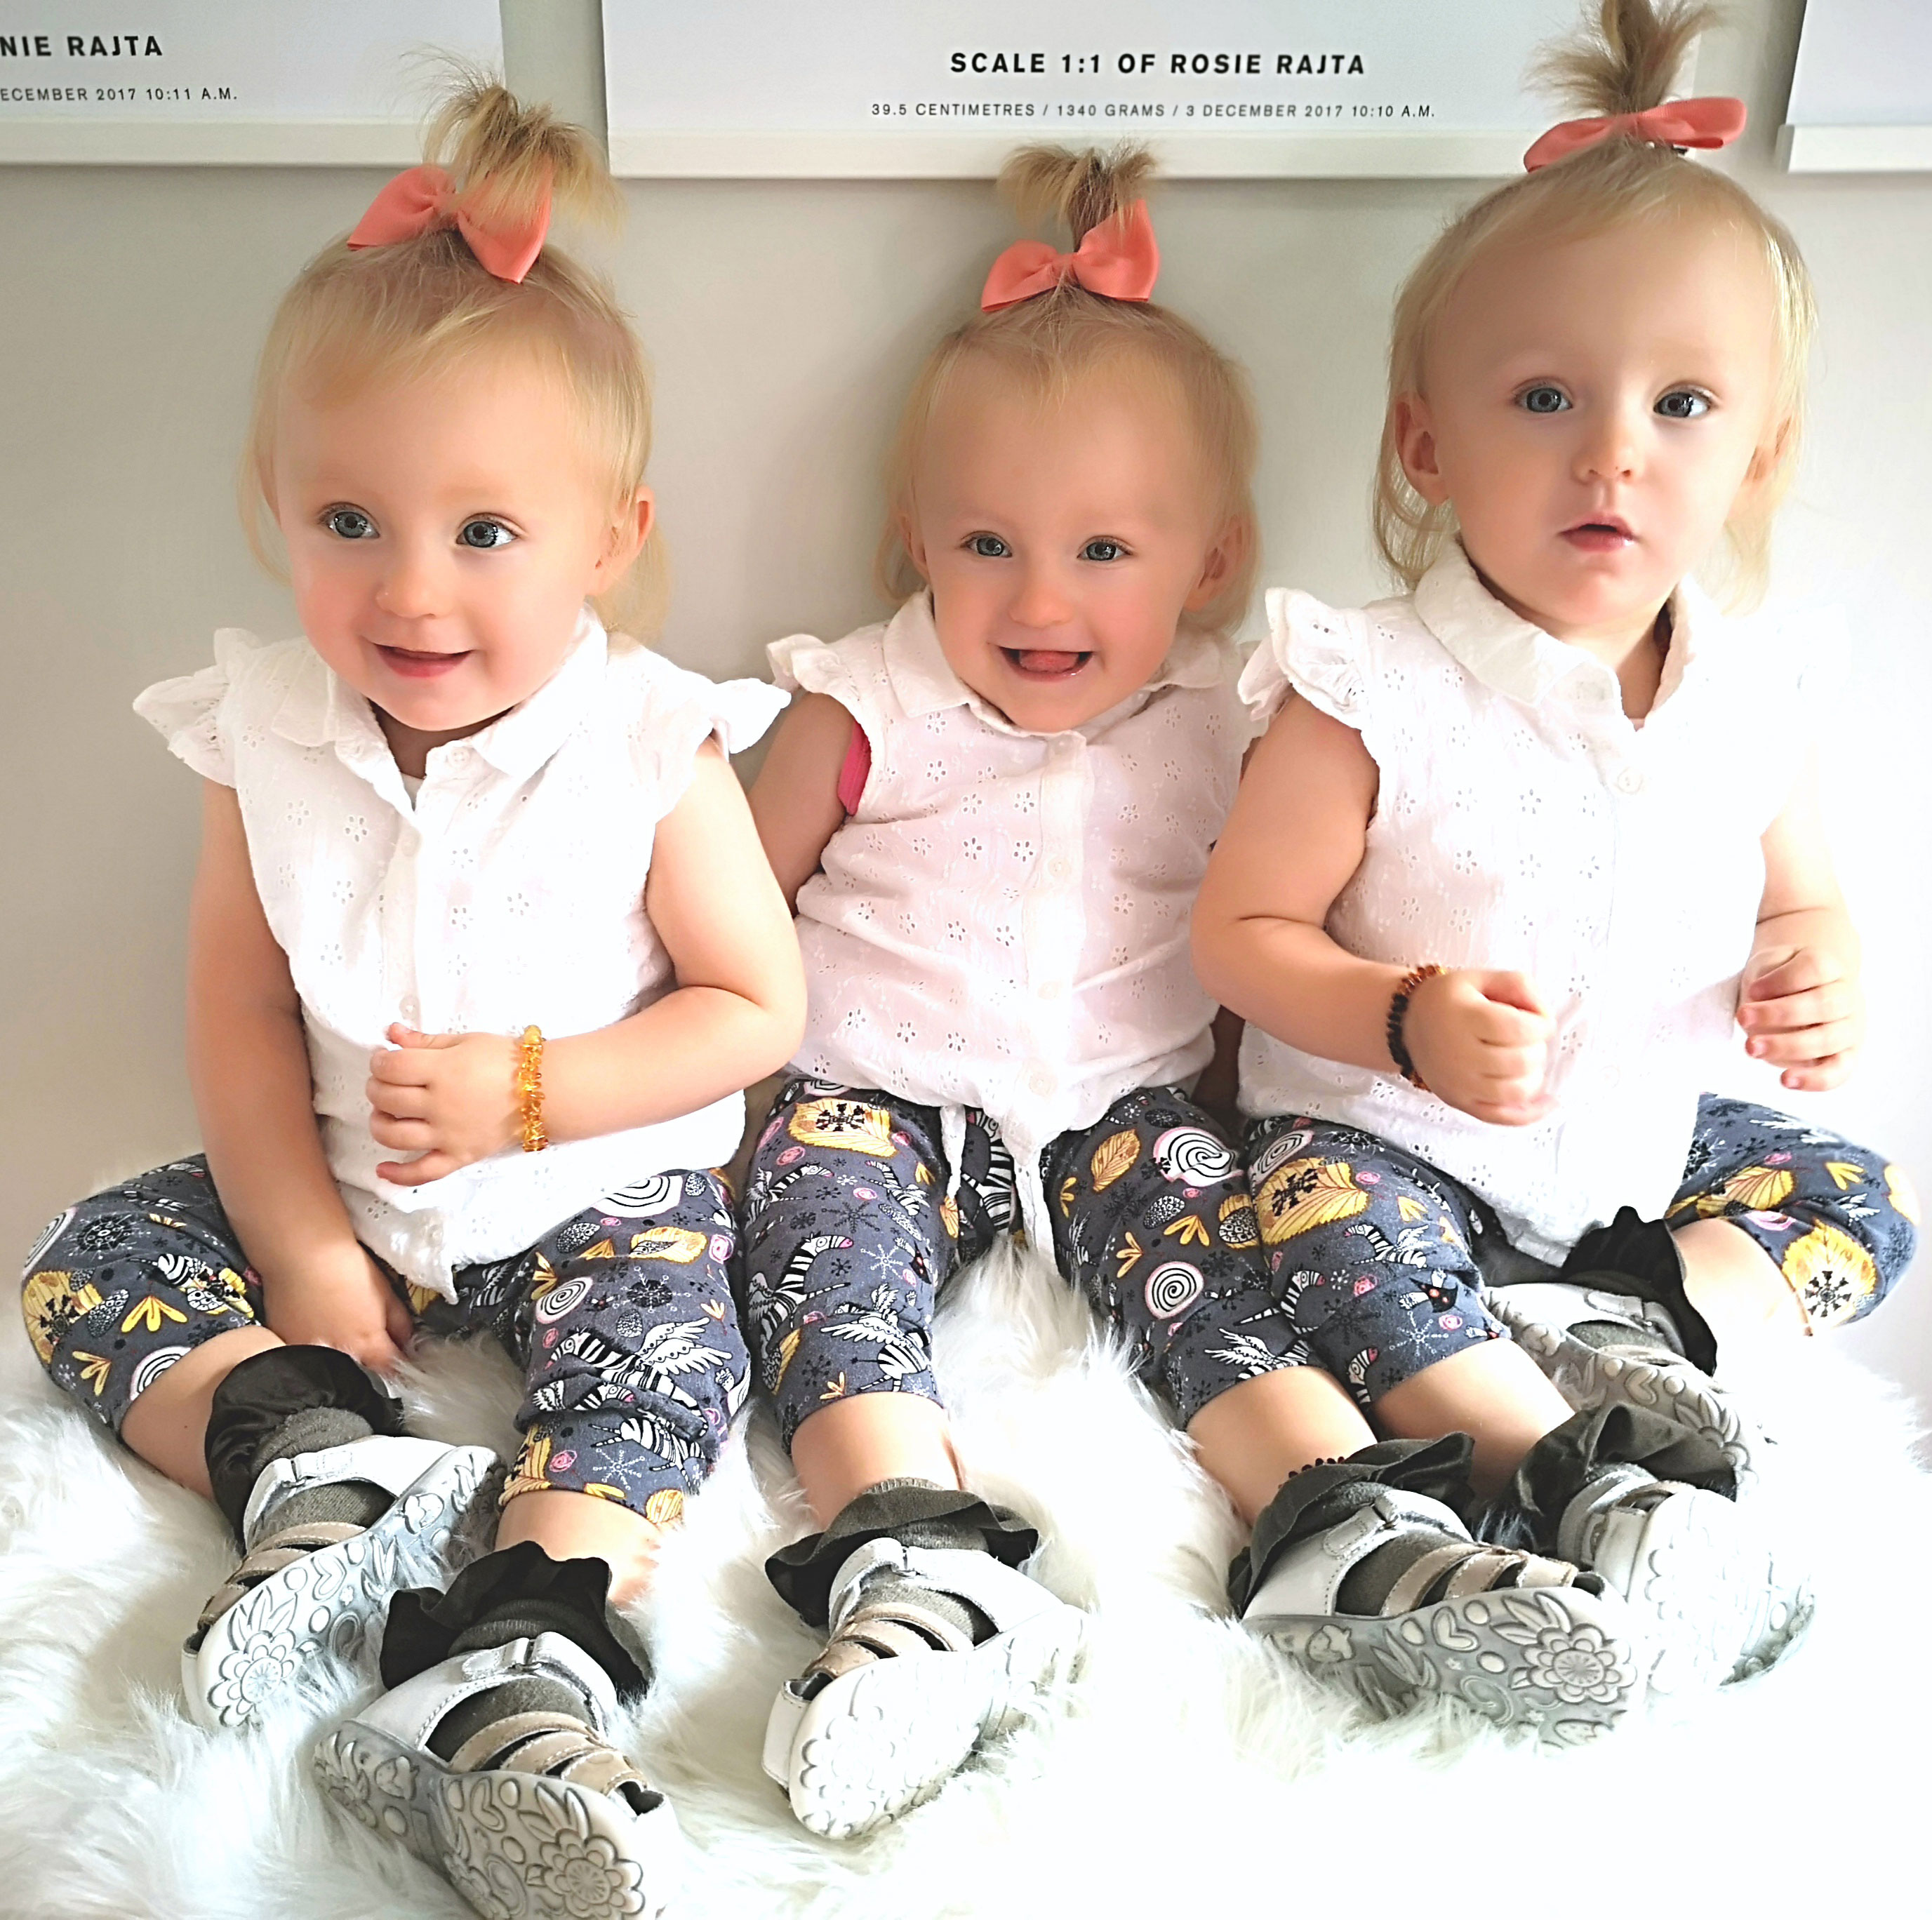 triplets 1